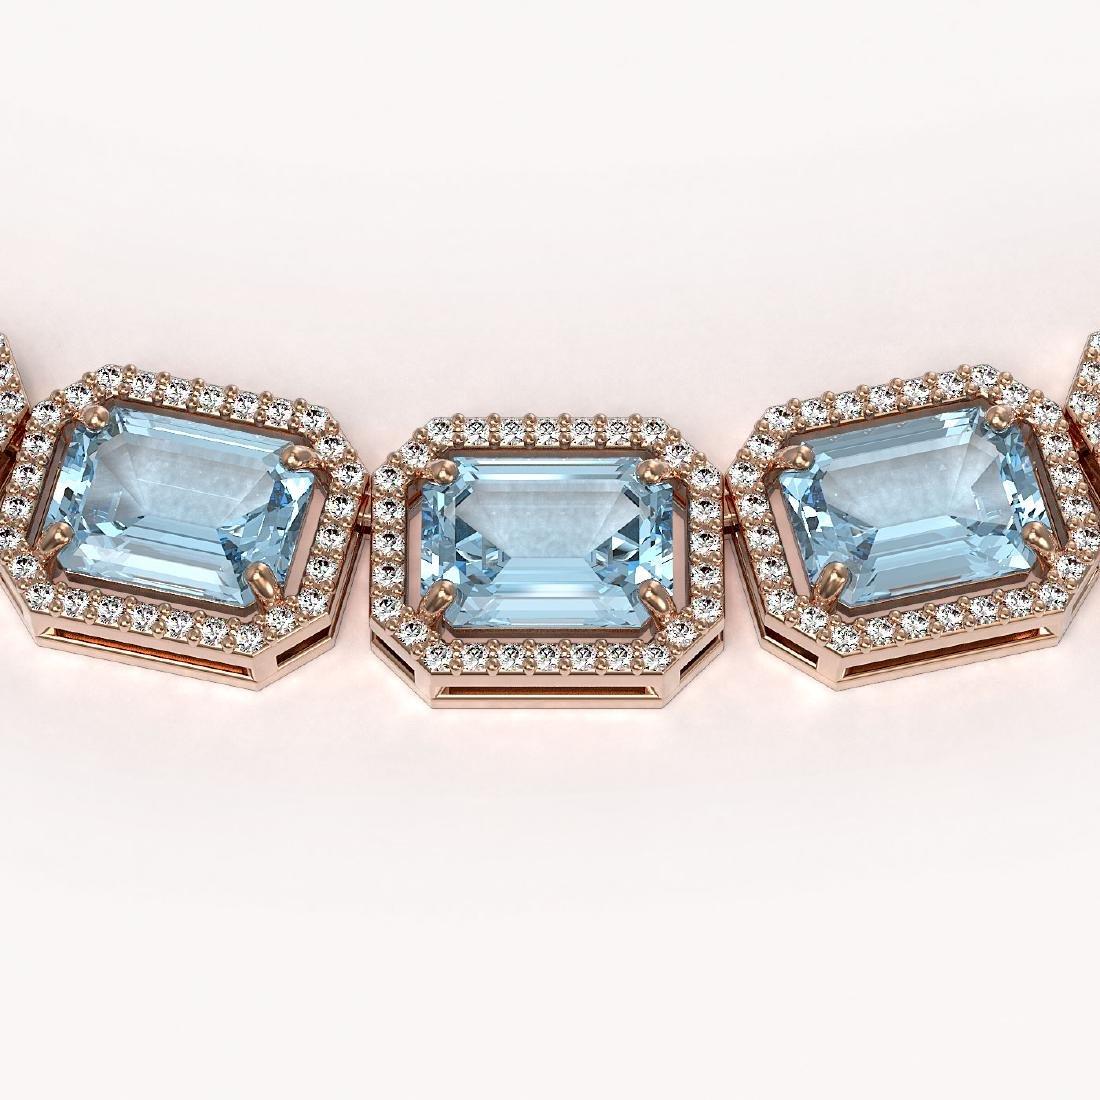 80.98 CTW Aquamarine & Diamond Halo Necklace 10K Rose - 3